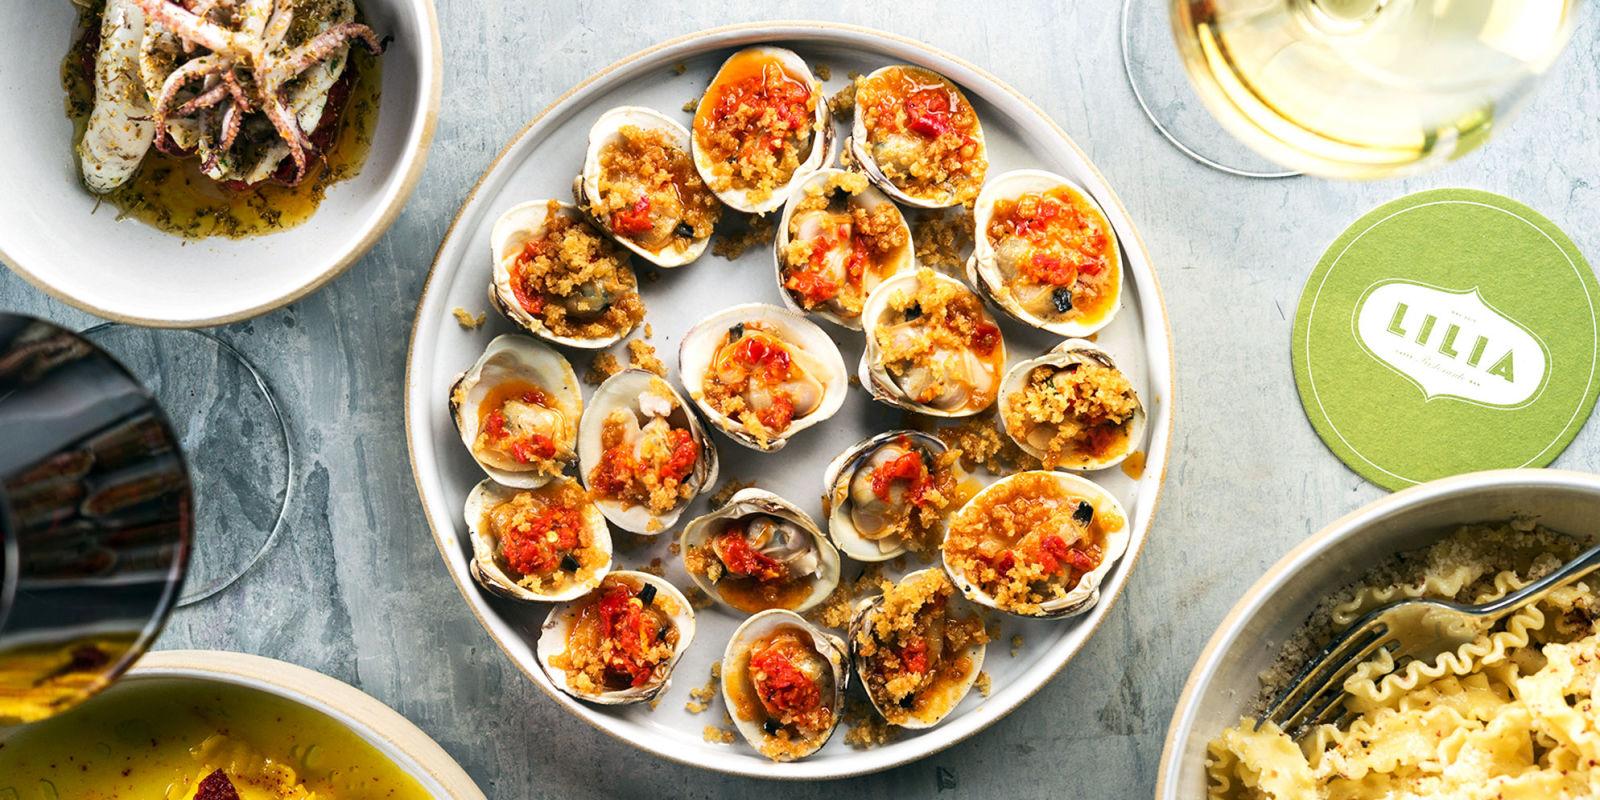 Italian Restaurant Near Me: 11 Best Italian Restaurants In NYC